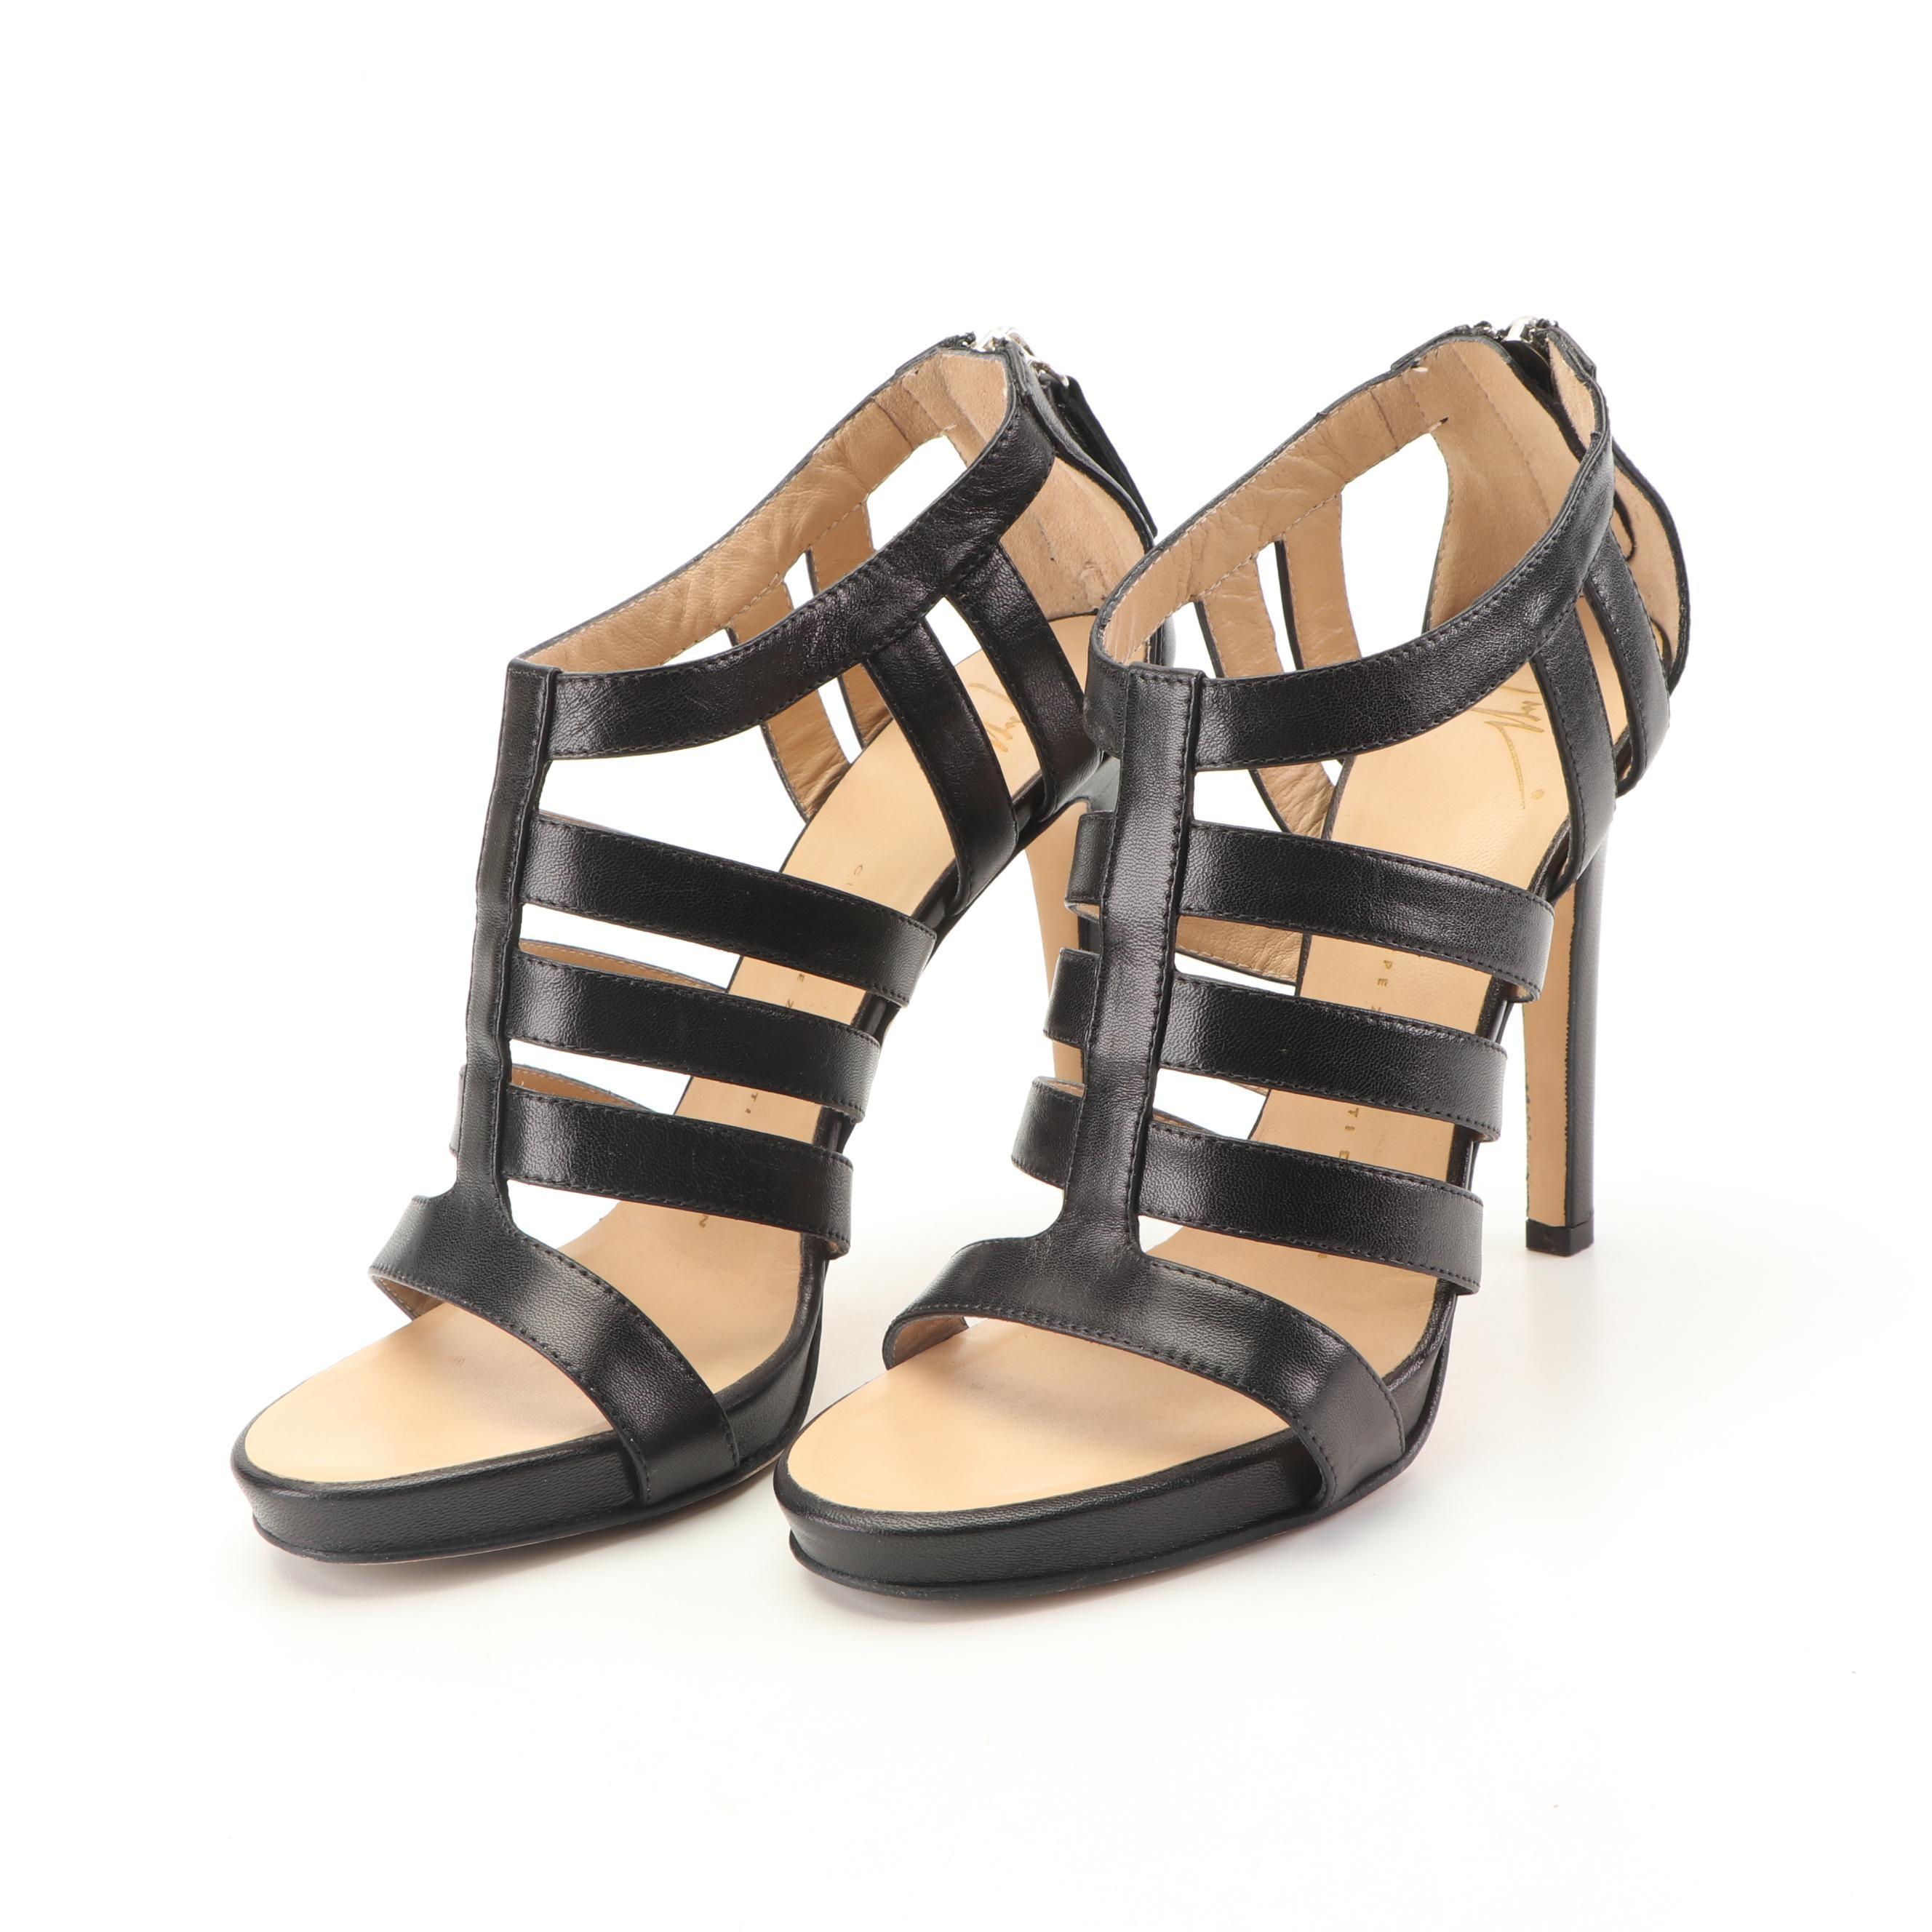 Giuseppe Zanotti Black Leather High-Heeled Gladiator Sandals